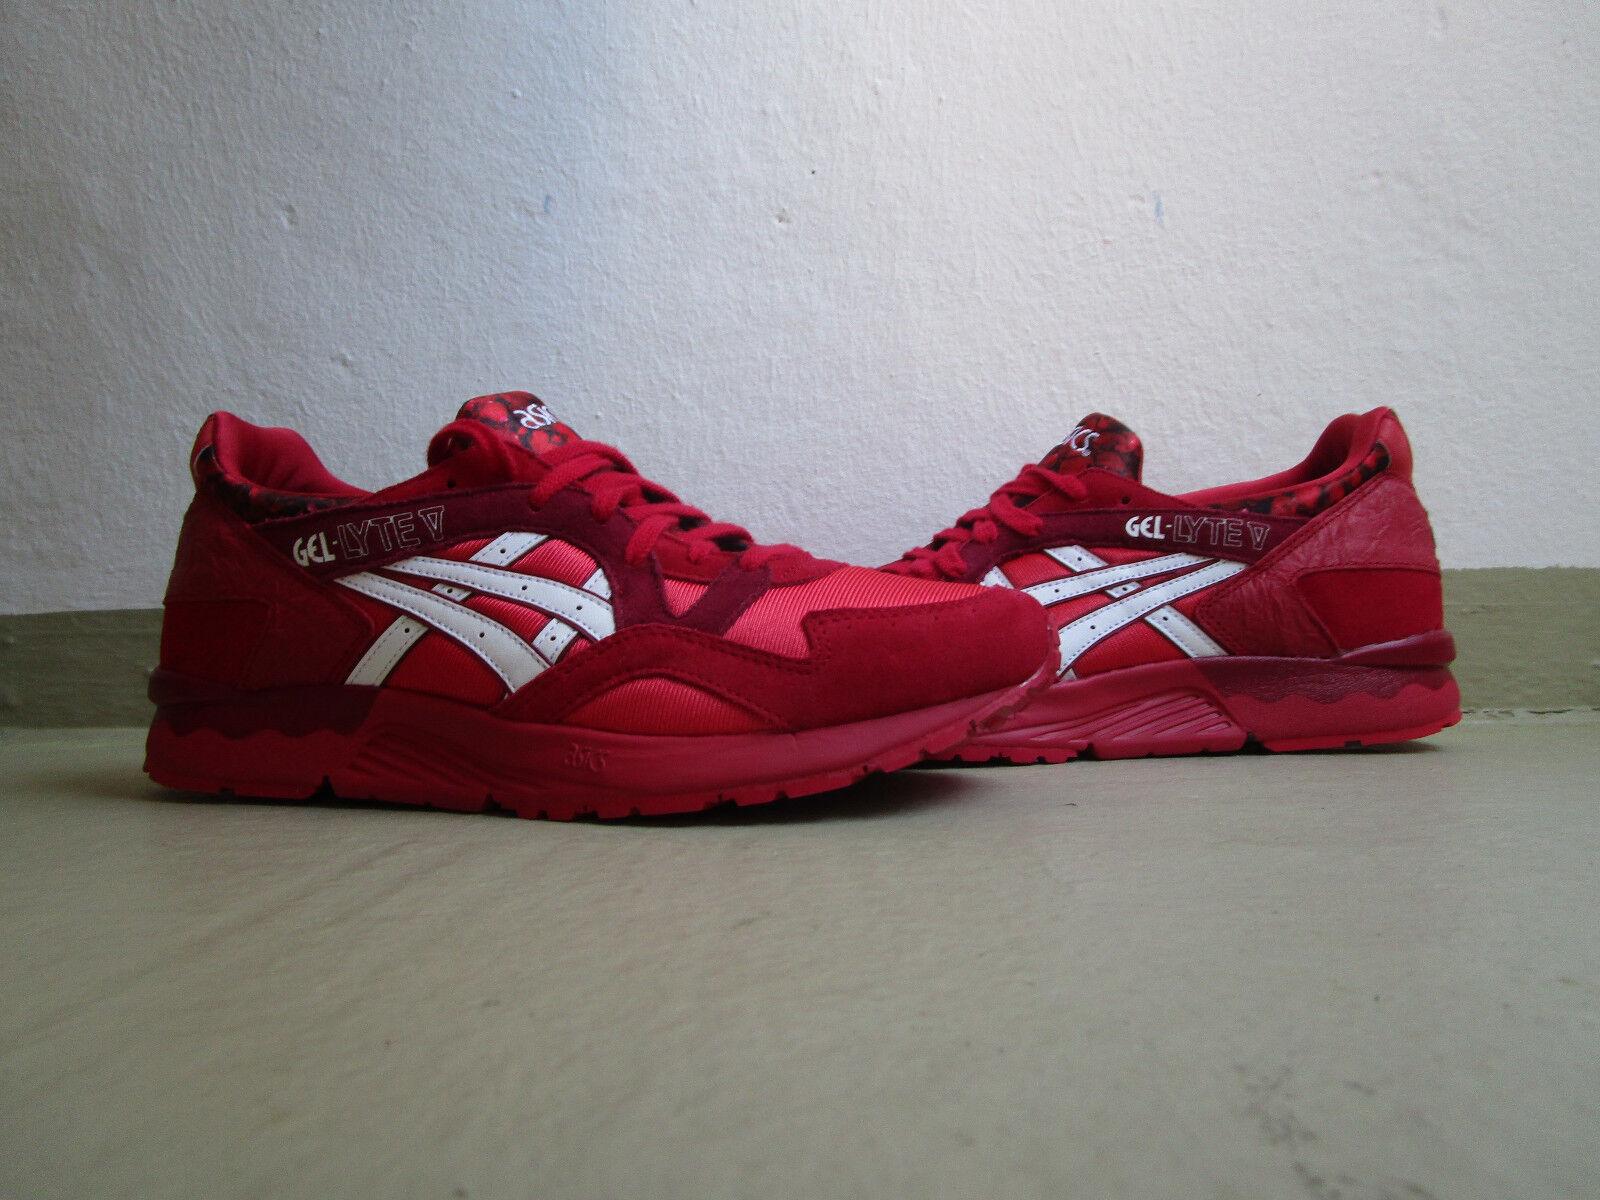 reputable site f1c85 d039f ... Levi s x Nike Air Jordan Jordan Jordan 4 NRG Denim Blue Sail Size 9.5  AO2571- ...